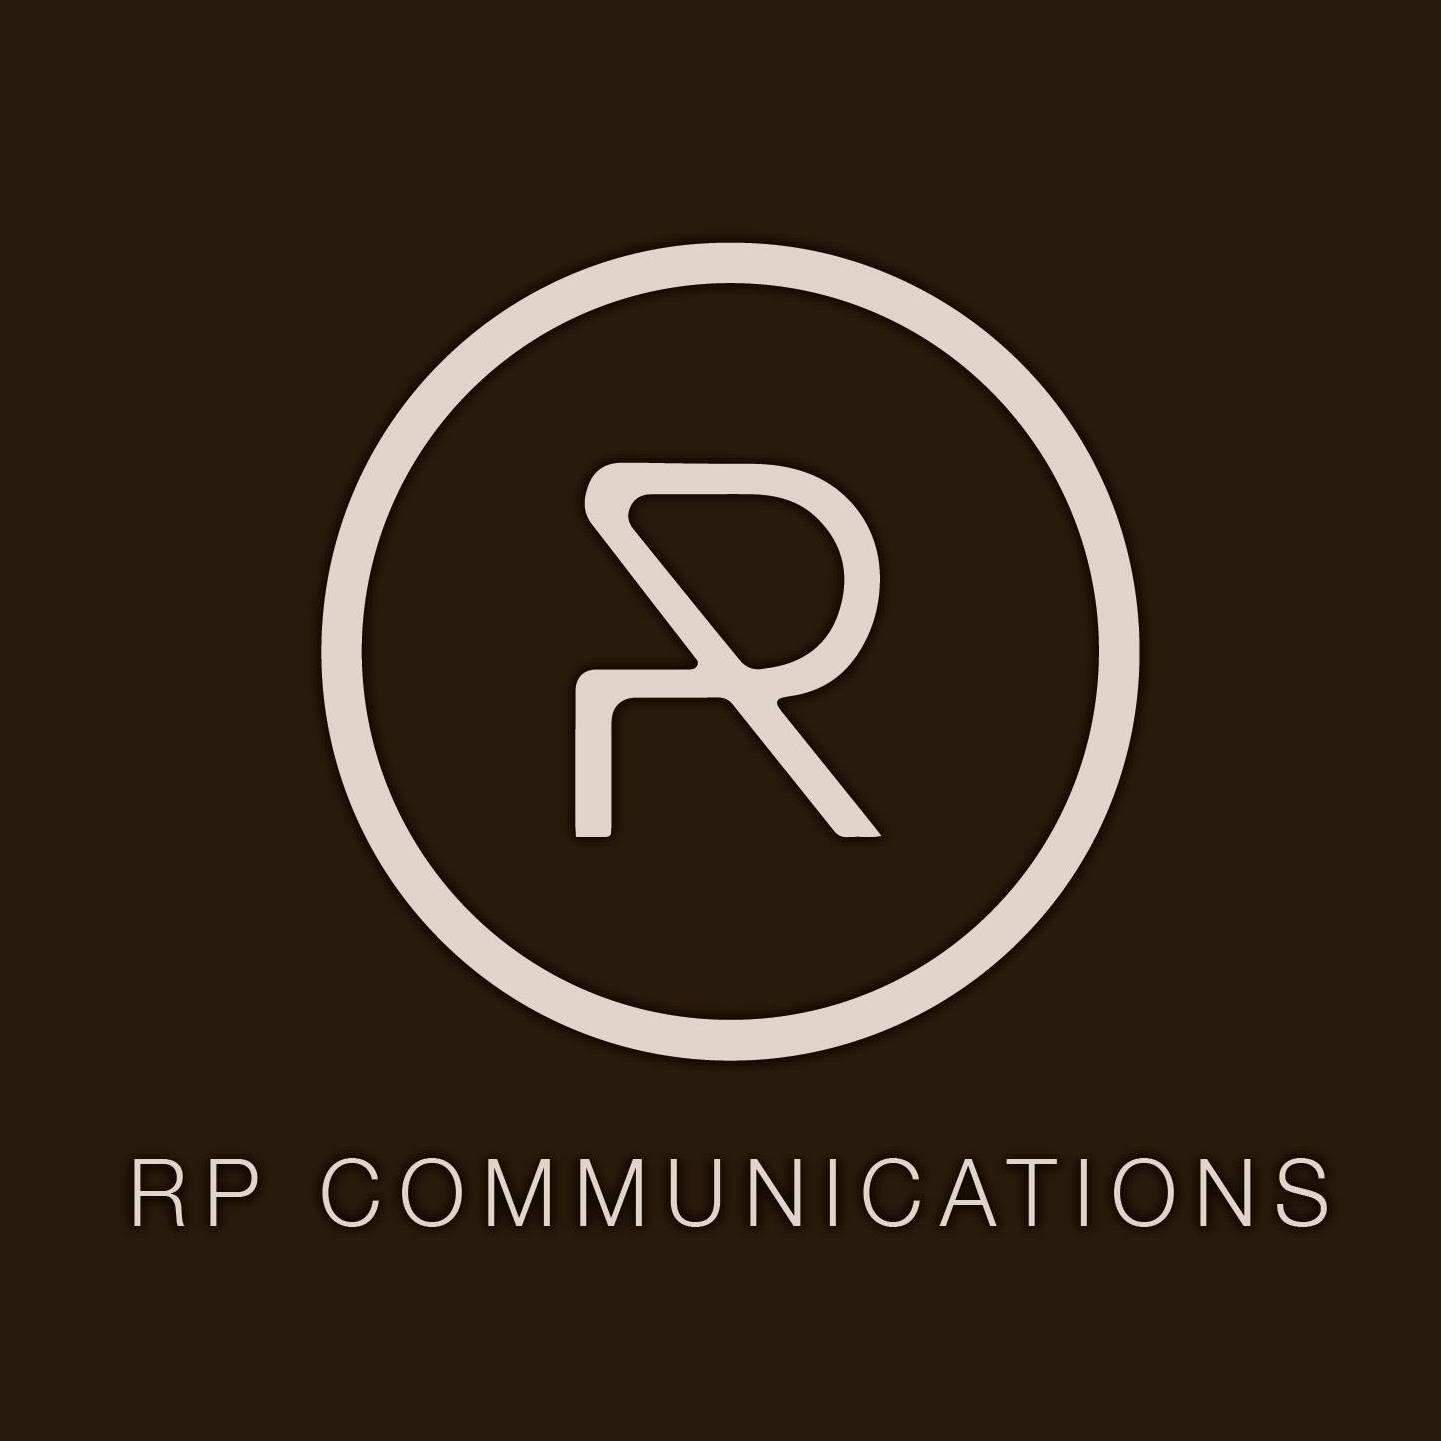 rp-communications-logo